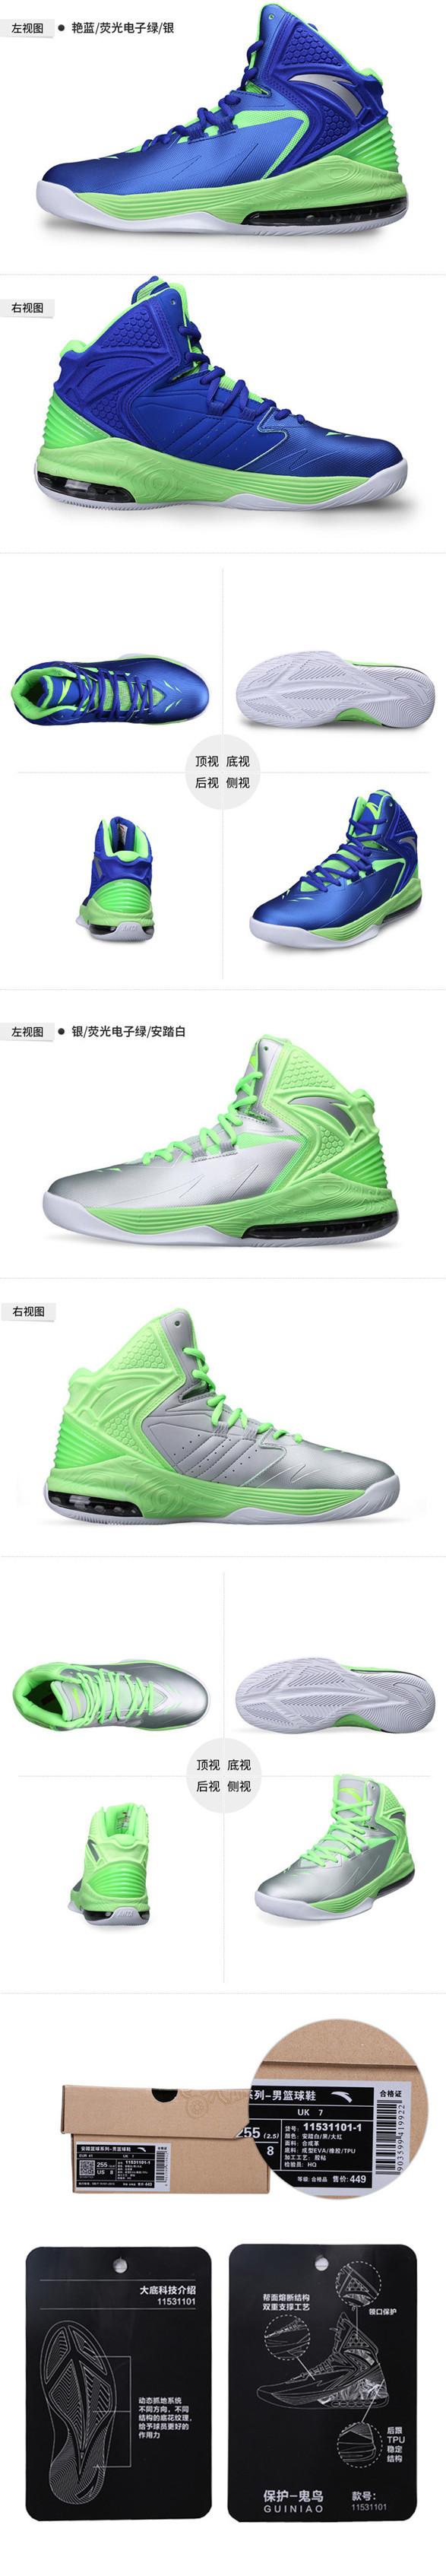 Anta NBA Ghost Birds Professional Basketball Shoes